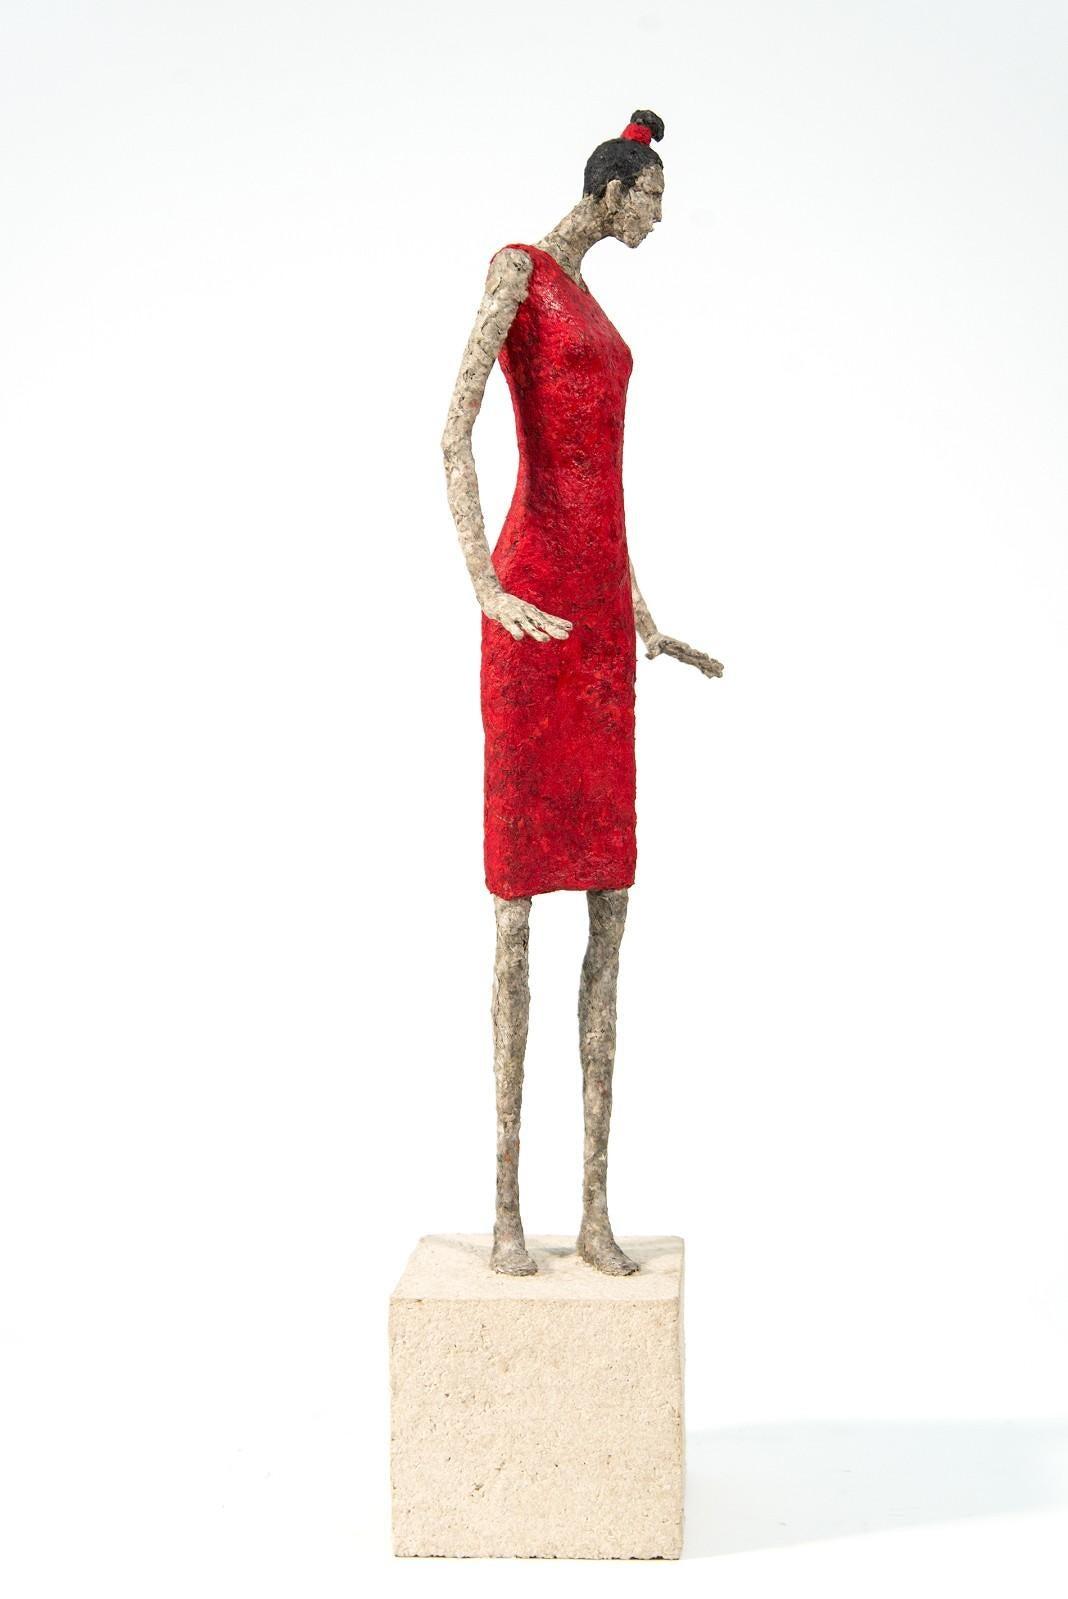 Francoise - expressive, textured, figurative, female, paper mache sculpture